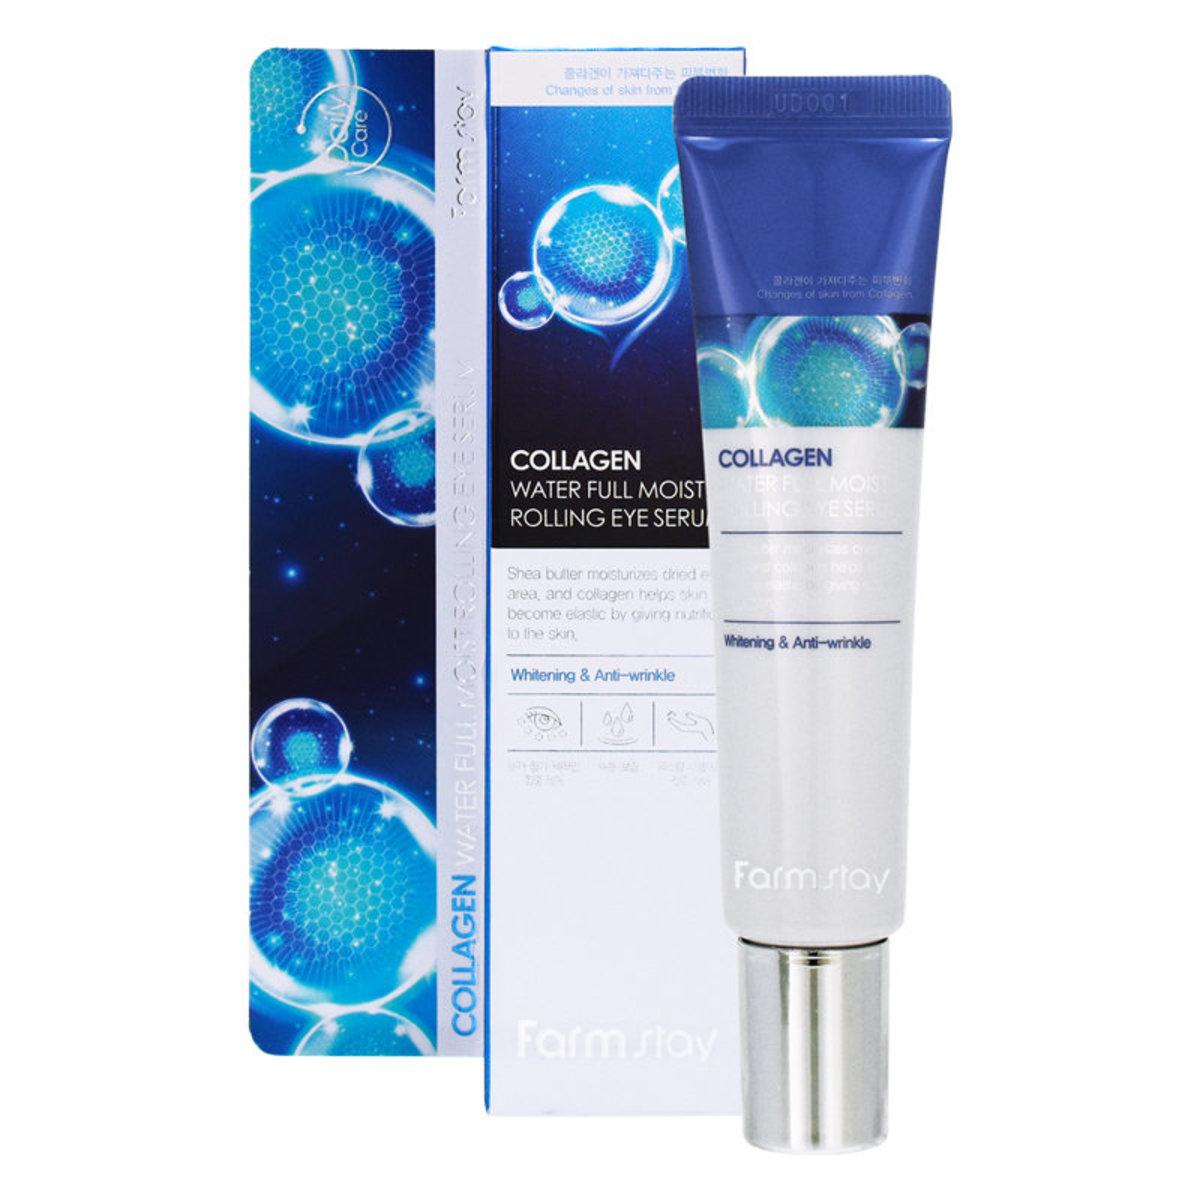 Collagen Water Full Moist Rolling Eye Serum 25ml - [Parallel Import Product]